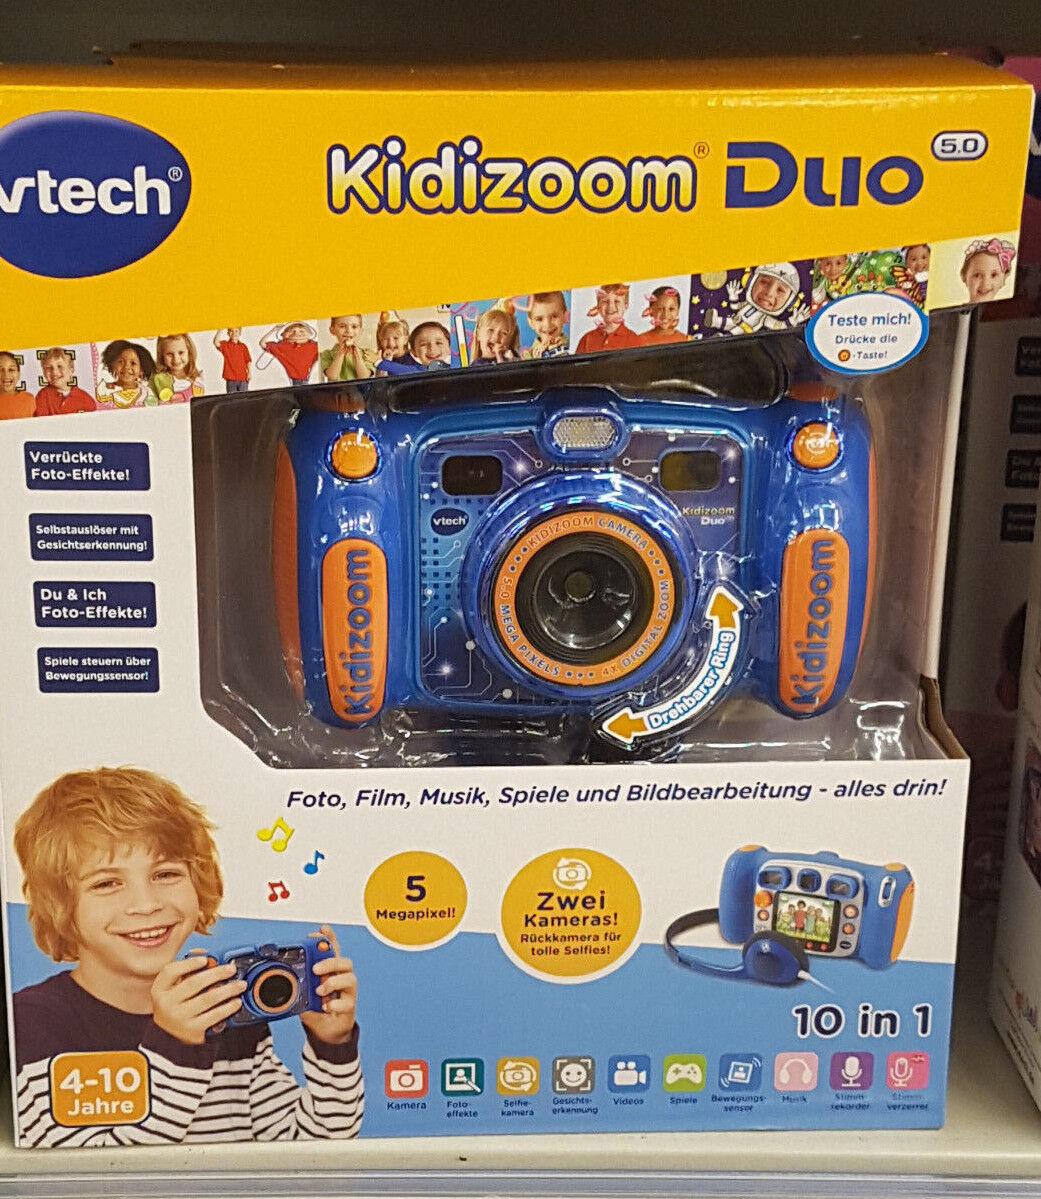 Vtech Kidizoom Duo Kamera Digitalkamera Digitalkamera Digitalkamera für Kinder NEU 10 in 1 Blau Orange c9967d